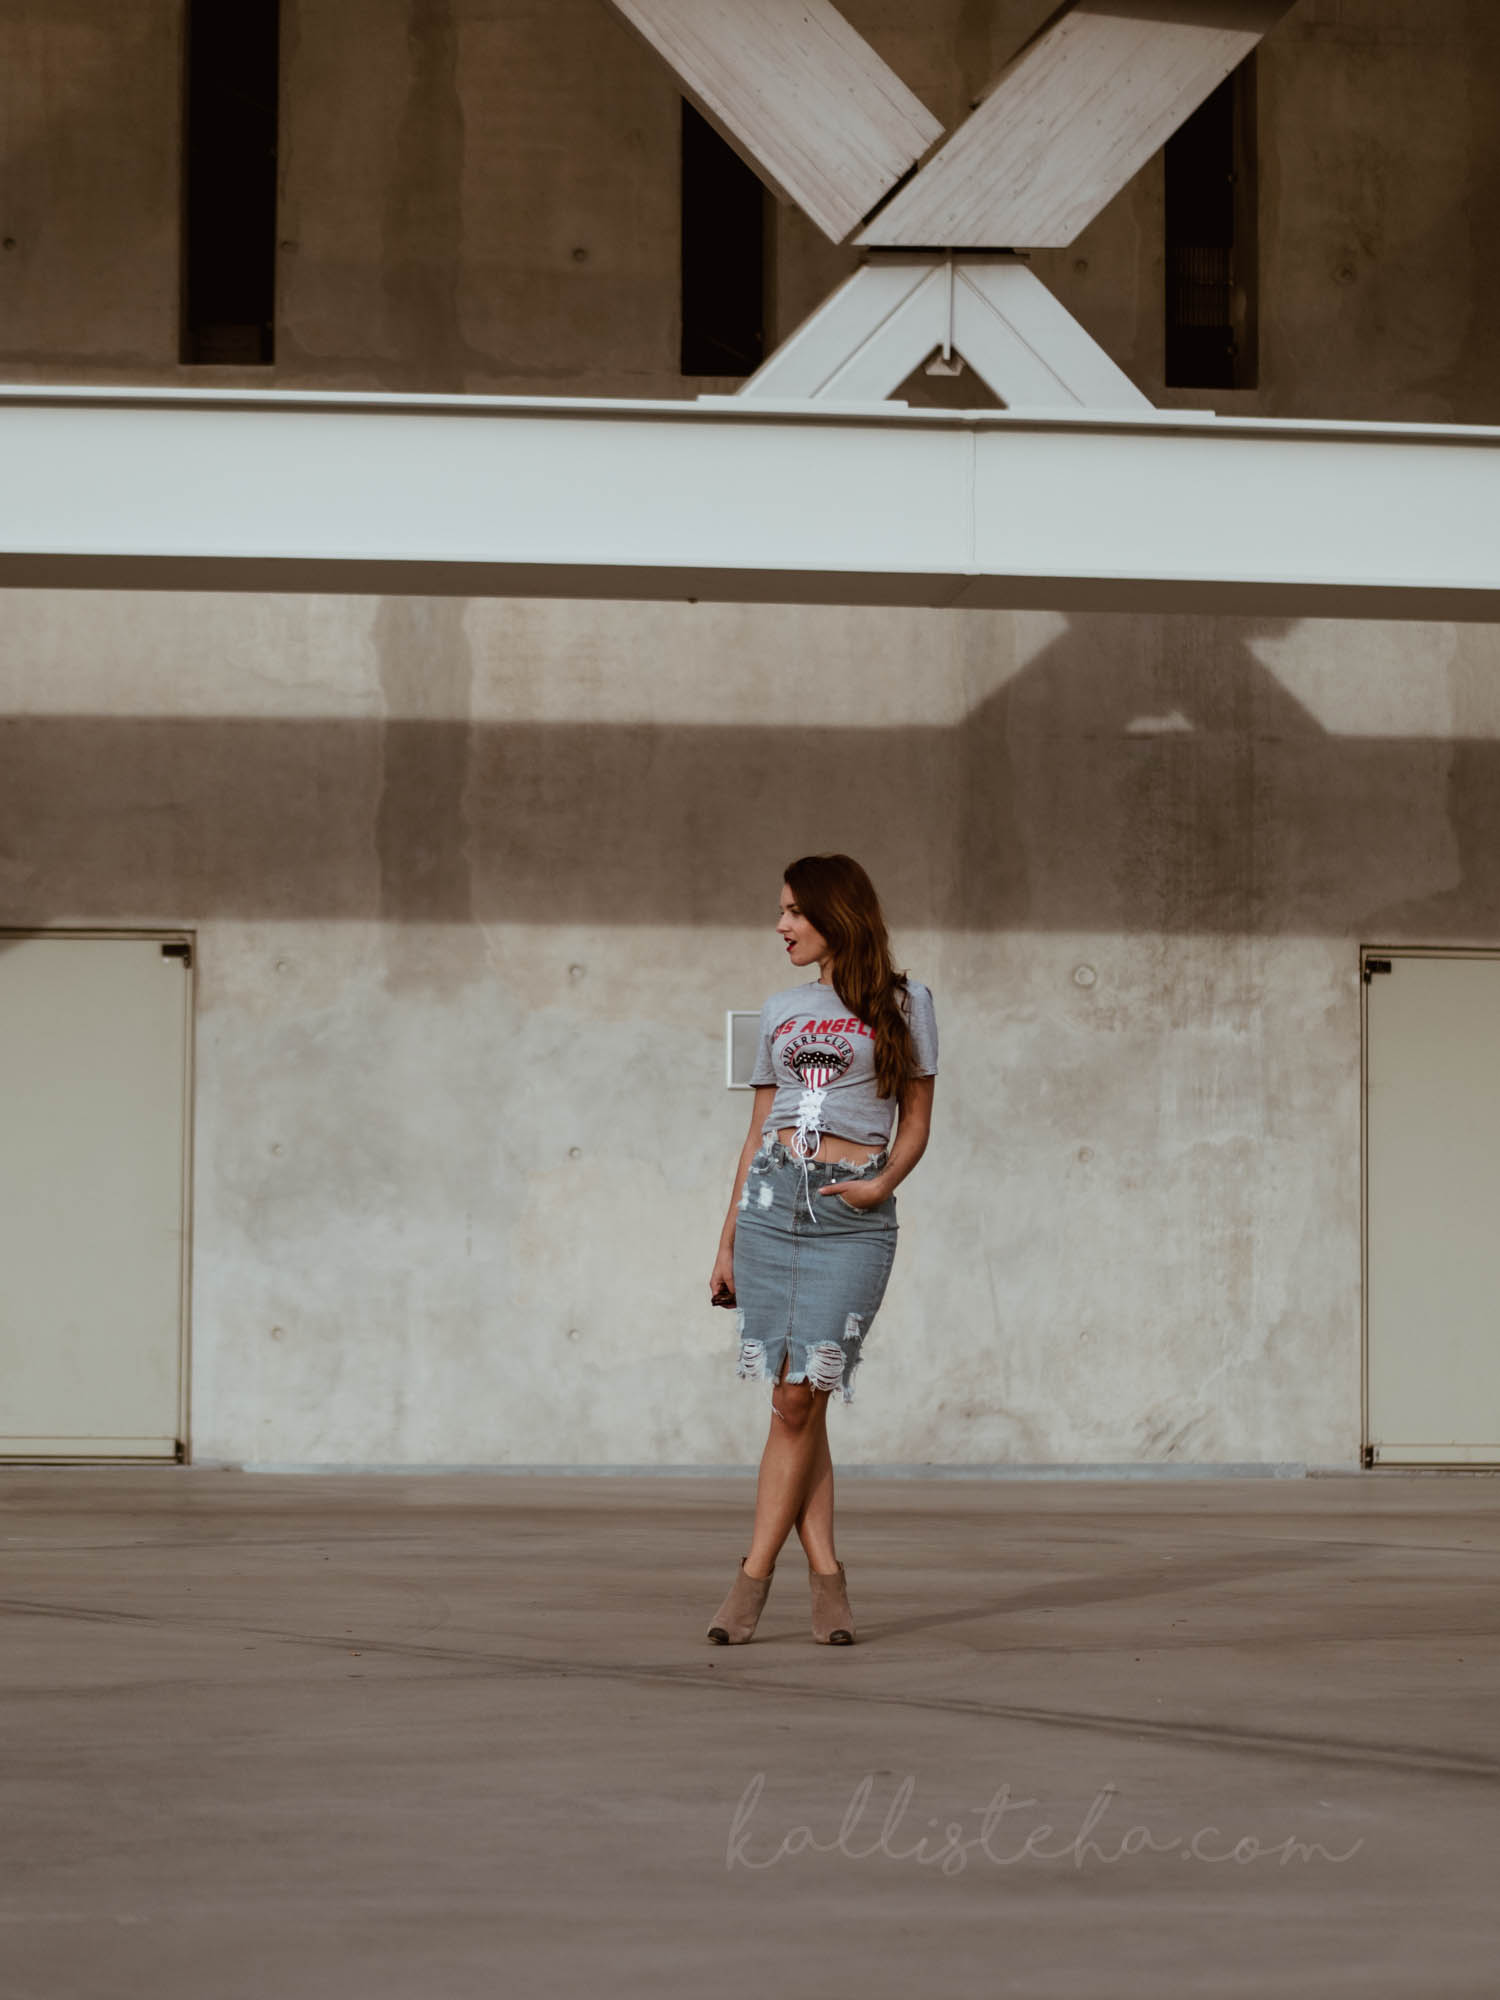 Look du jour - Urban jeans - Kallisteha blog - IG @kallisteha